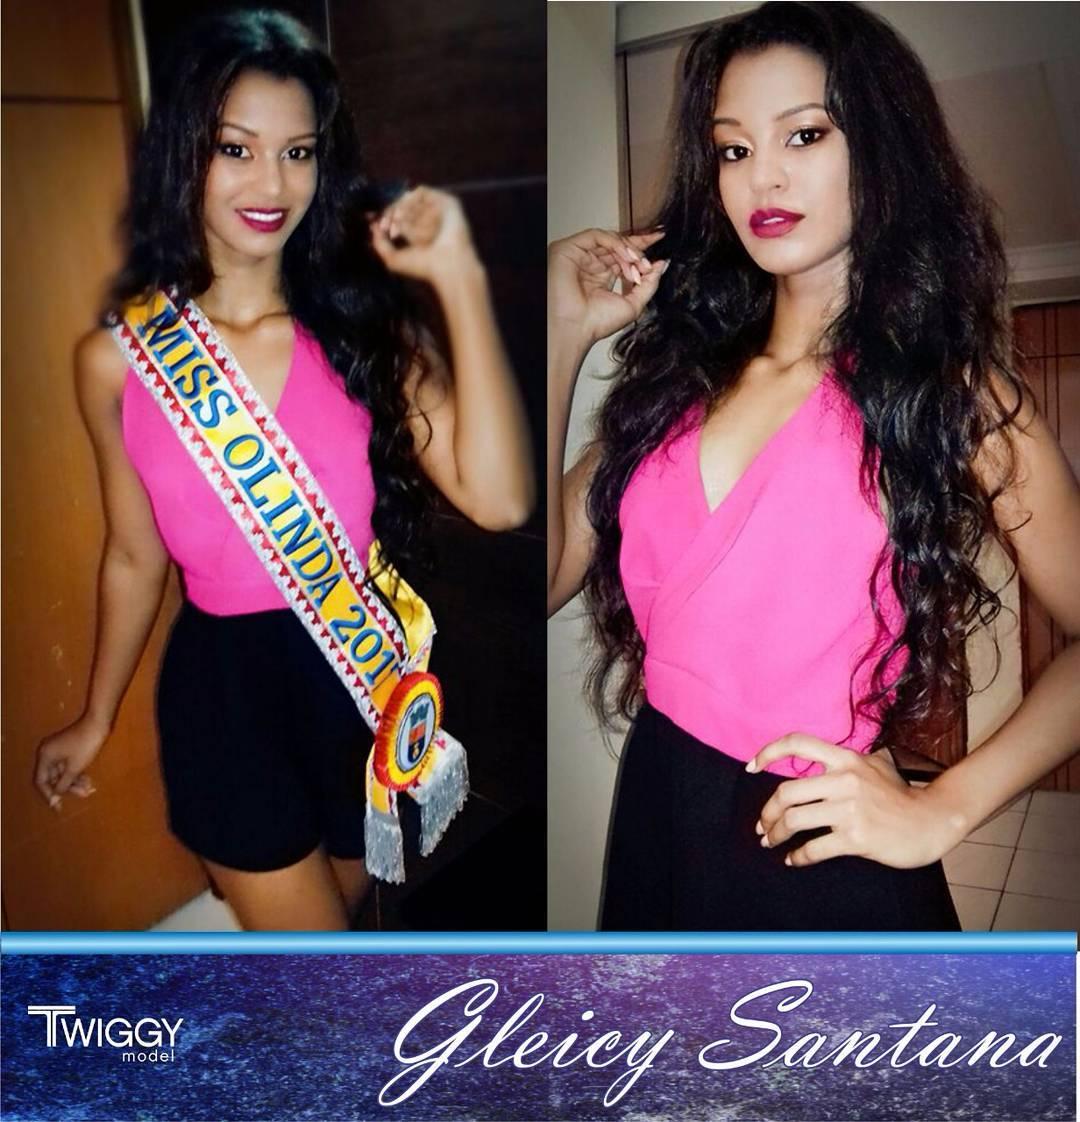 gleicyane santana, miss olinda universo 2017. P8m6j8pk